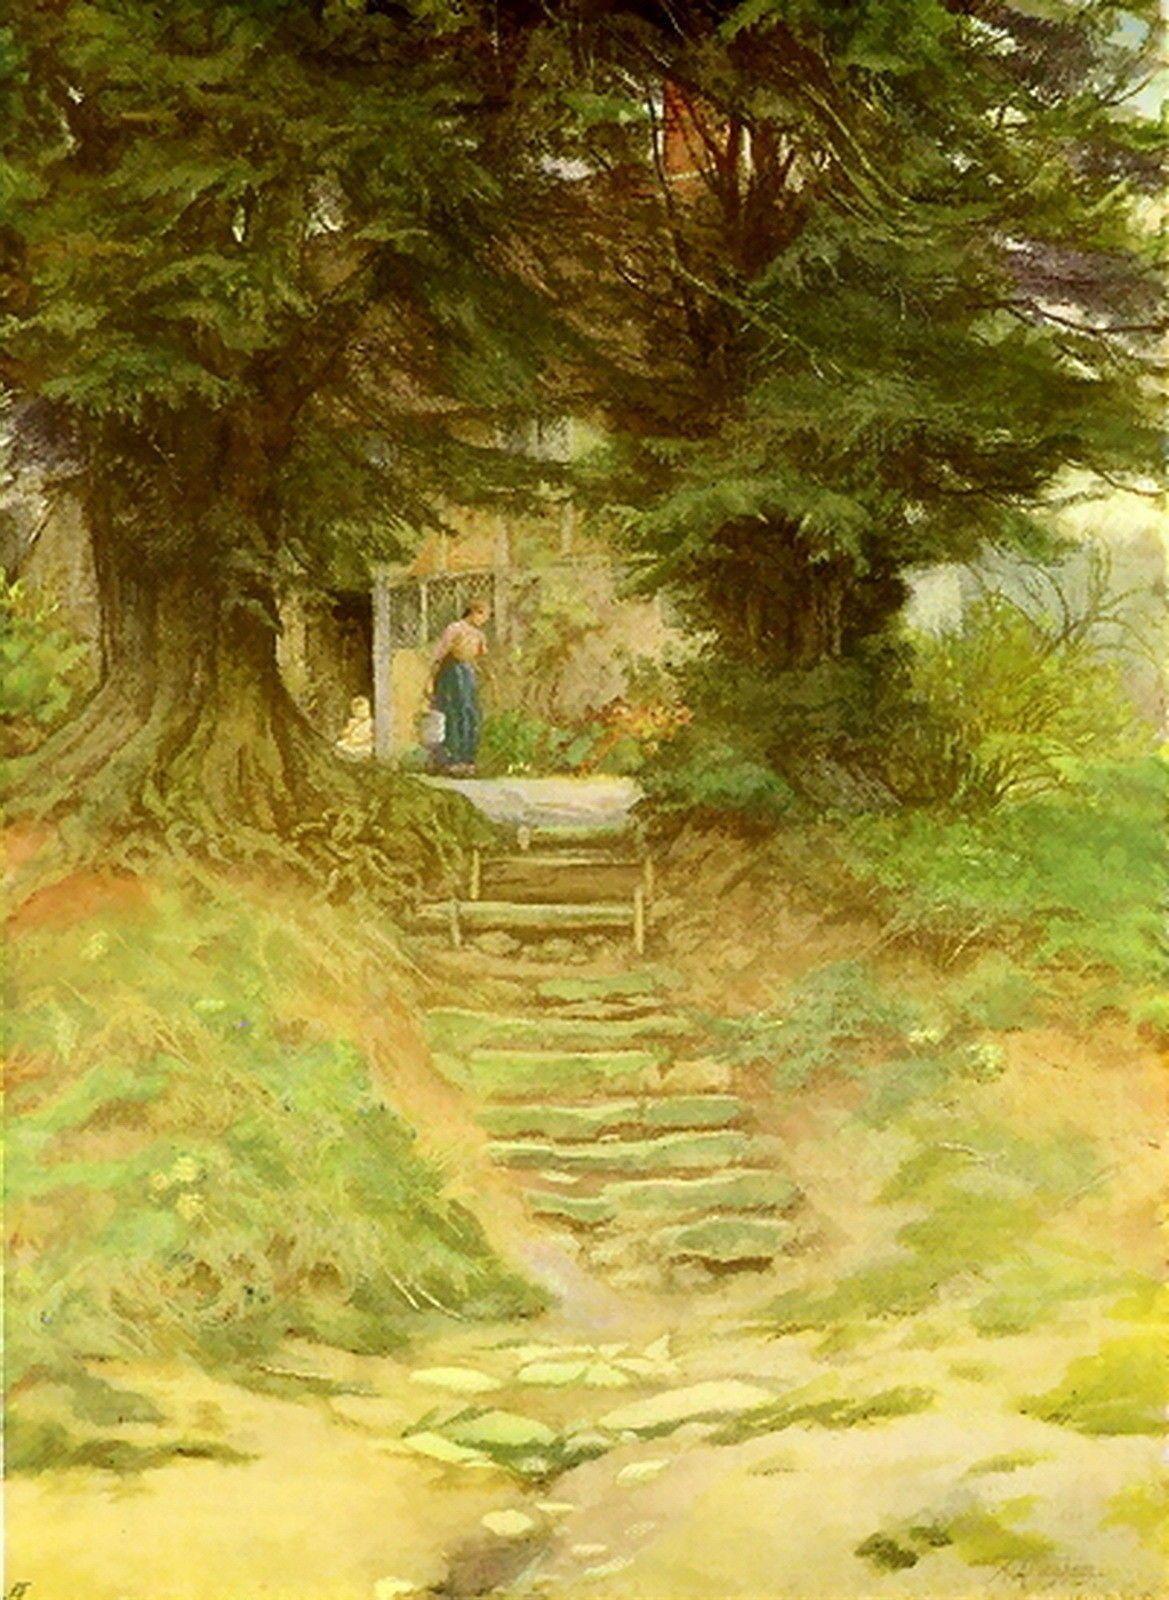 Antique 110 yr Helen Allingham Print c19th Landscape Cottage Near Crocken Hill | eBay